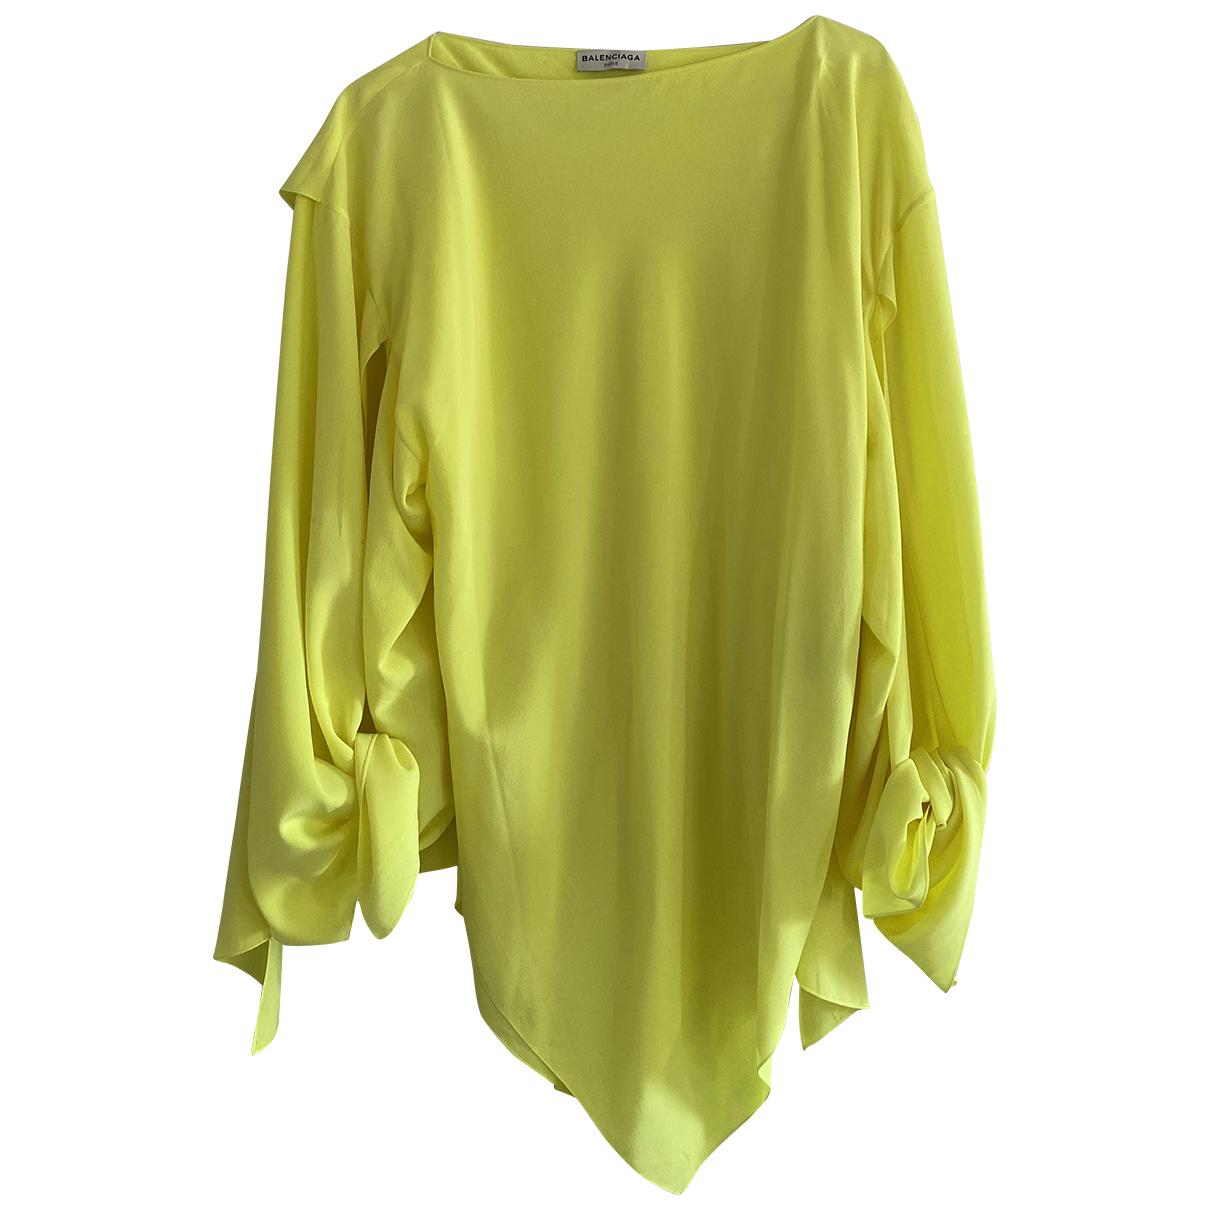 Balenciaga - Top   pour femme en soie - jaune